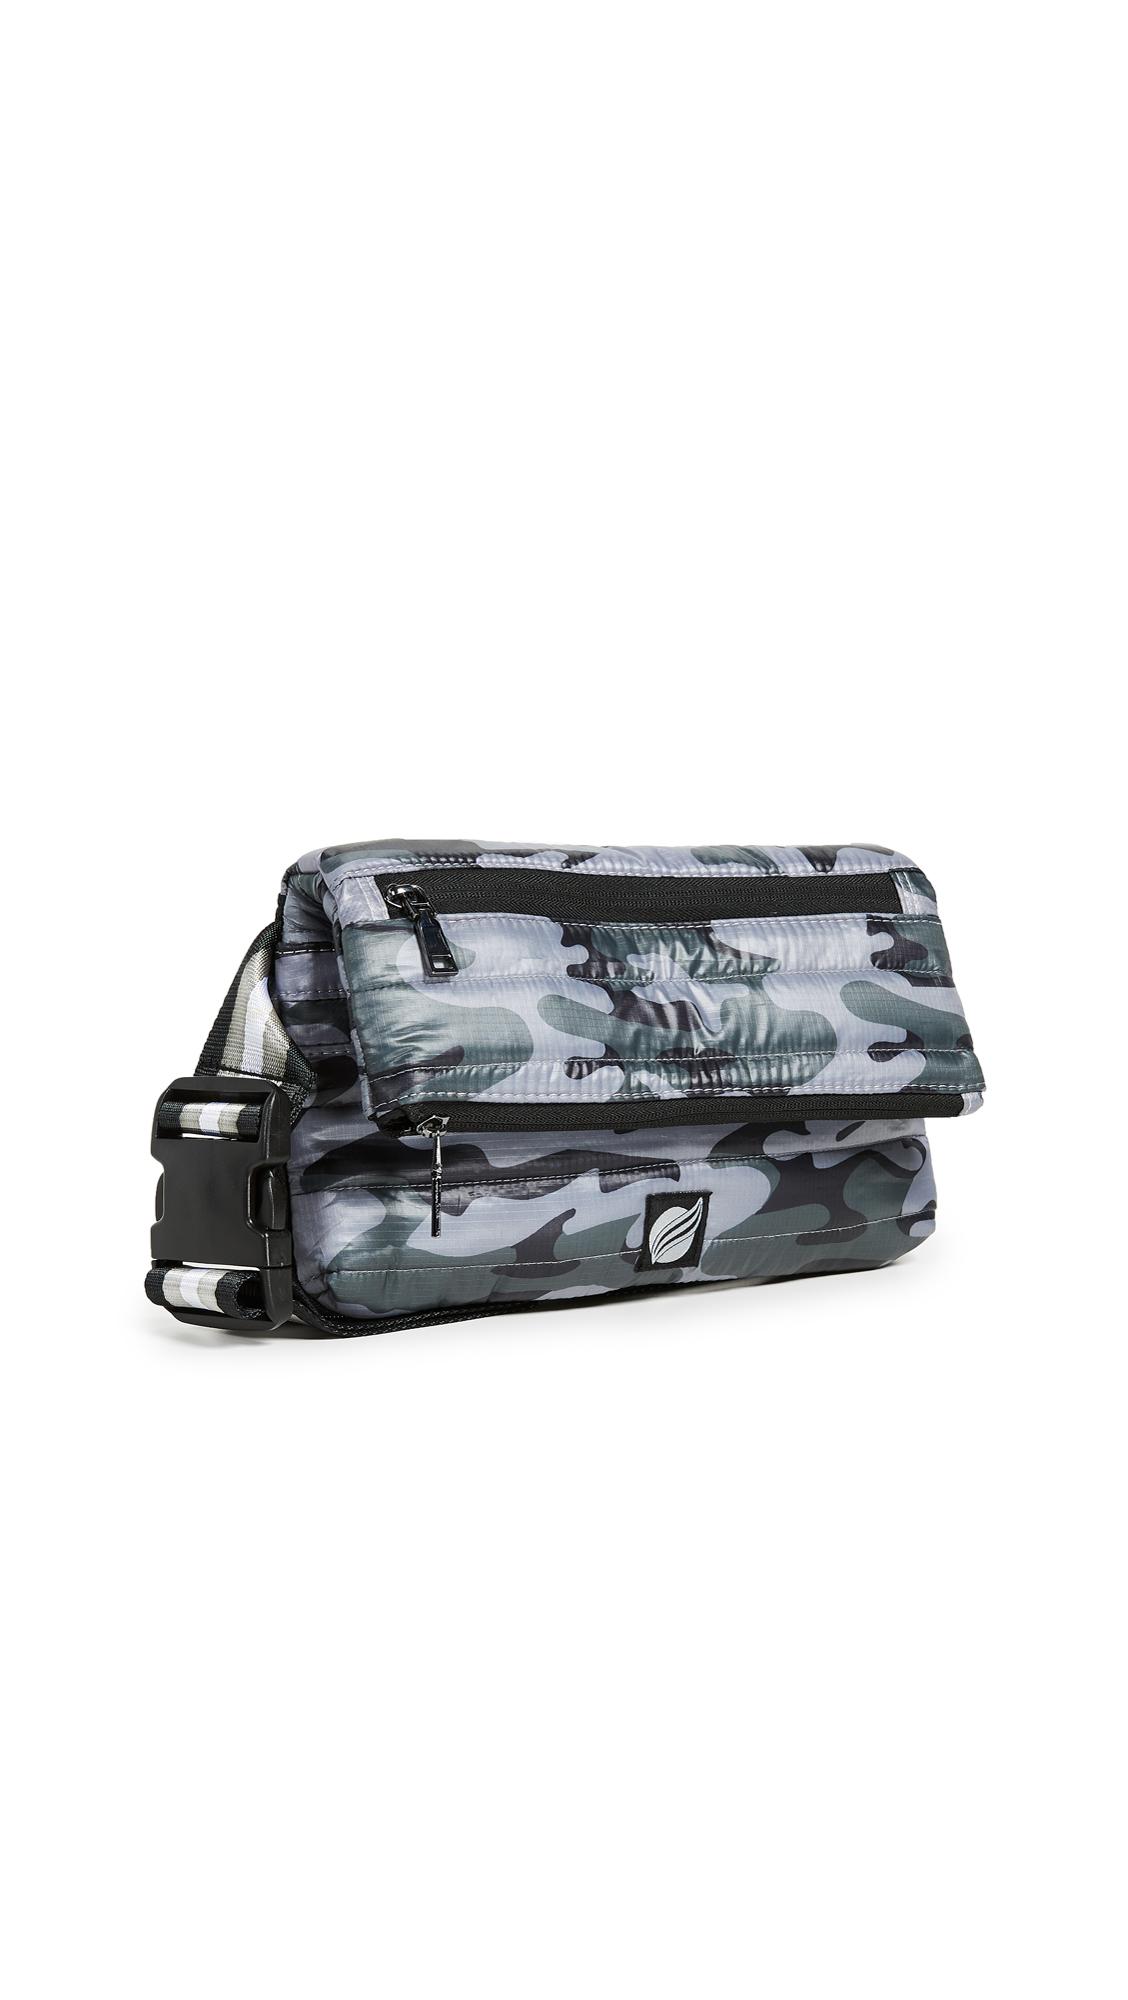 Convertible Belt Cross Body Bag, Tribeca Grey Camo